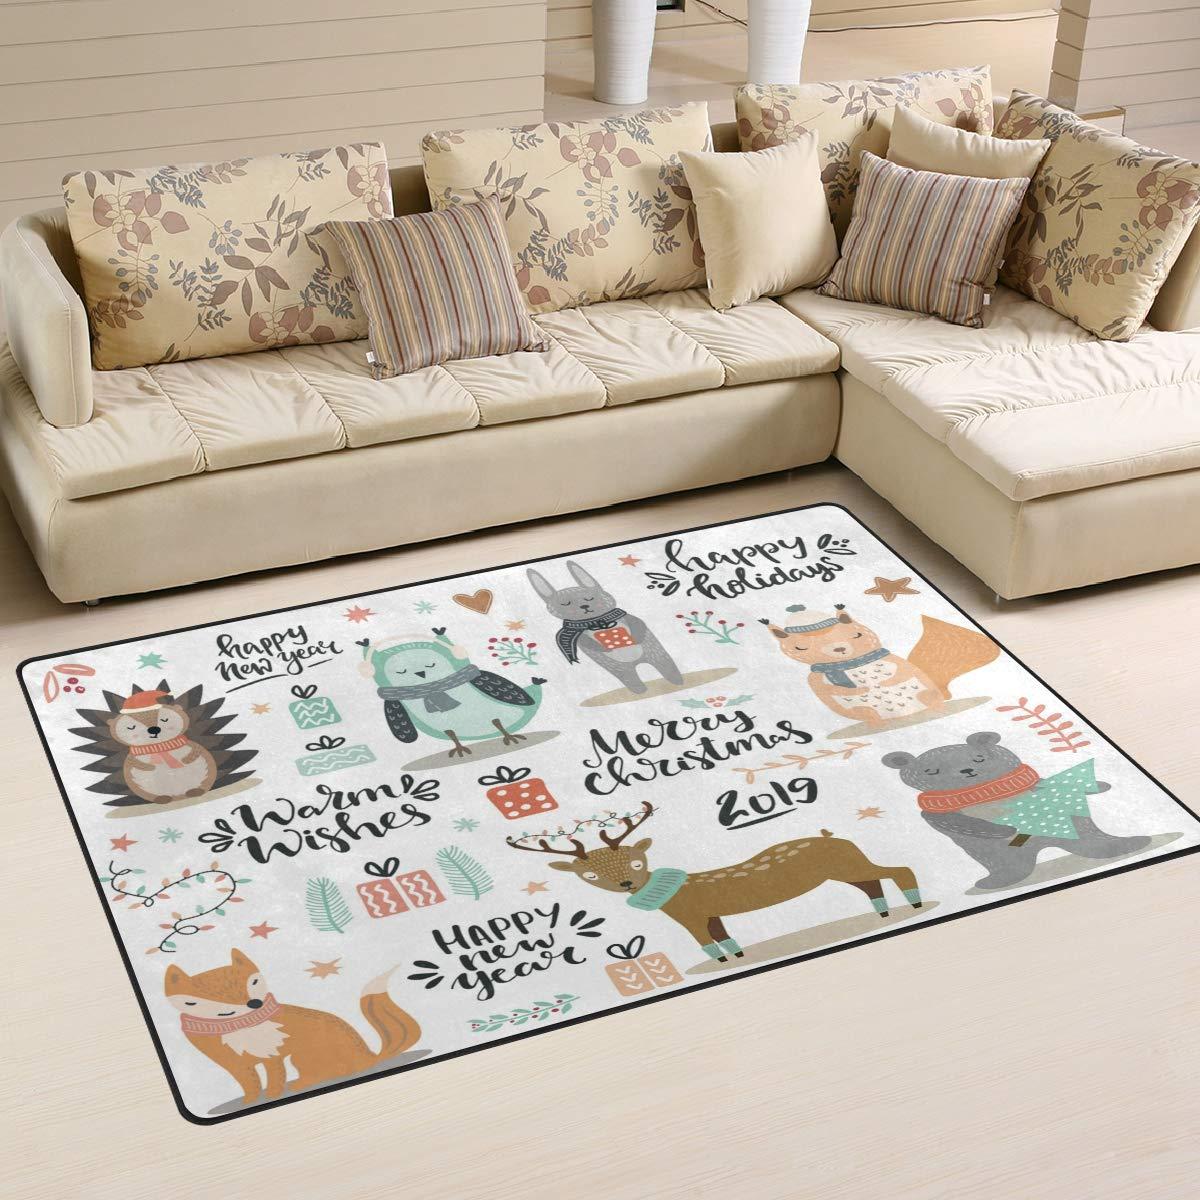 ALAZA Home Decor Set of Winter Woodland Animals Christmas?Fox Deer Owl Rabbit Bear Area Rug Carpet, Rugs Floor Carpet Mat Living Room Carpet for Girl's Room Home Indoor Decor 3'x5'